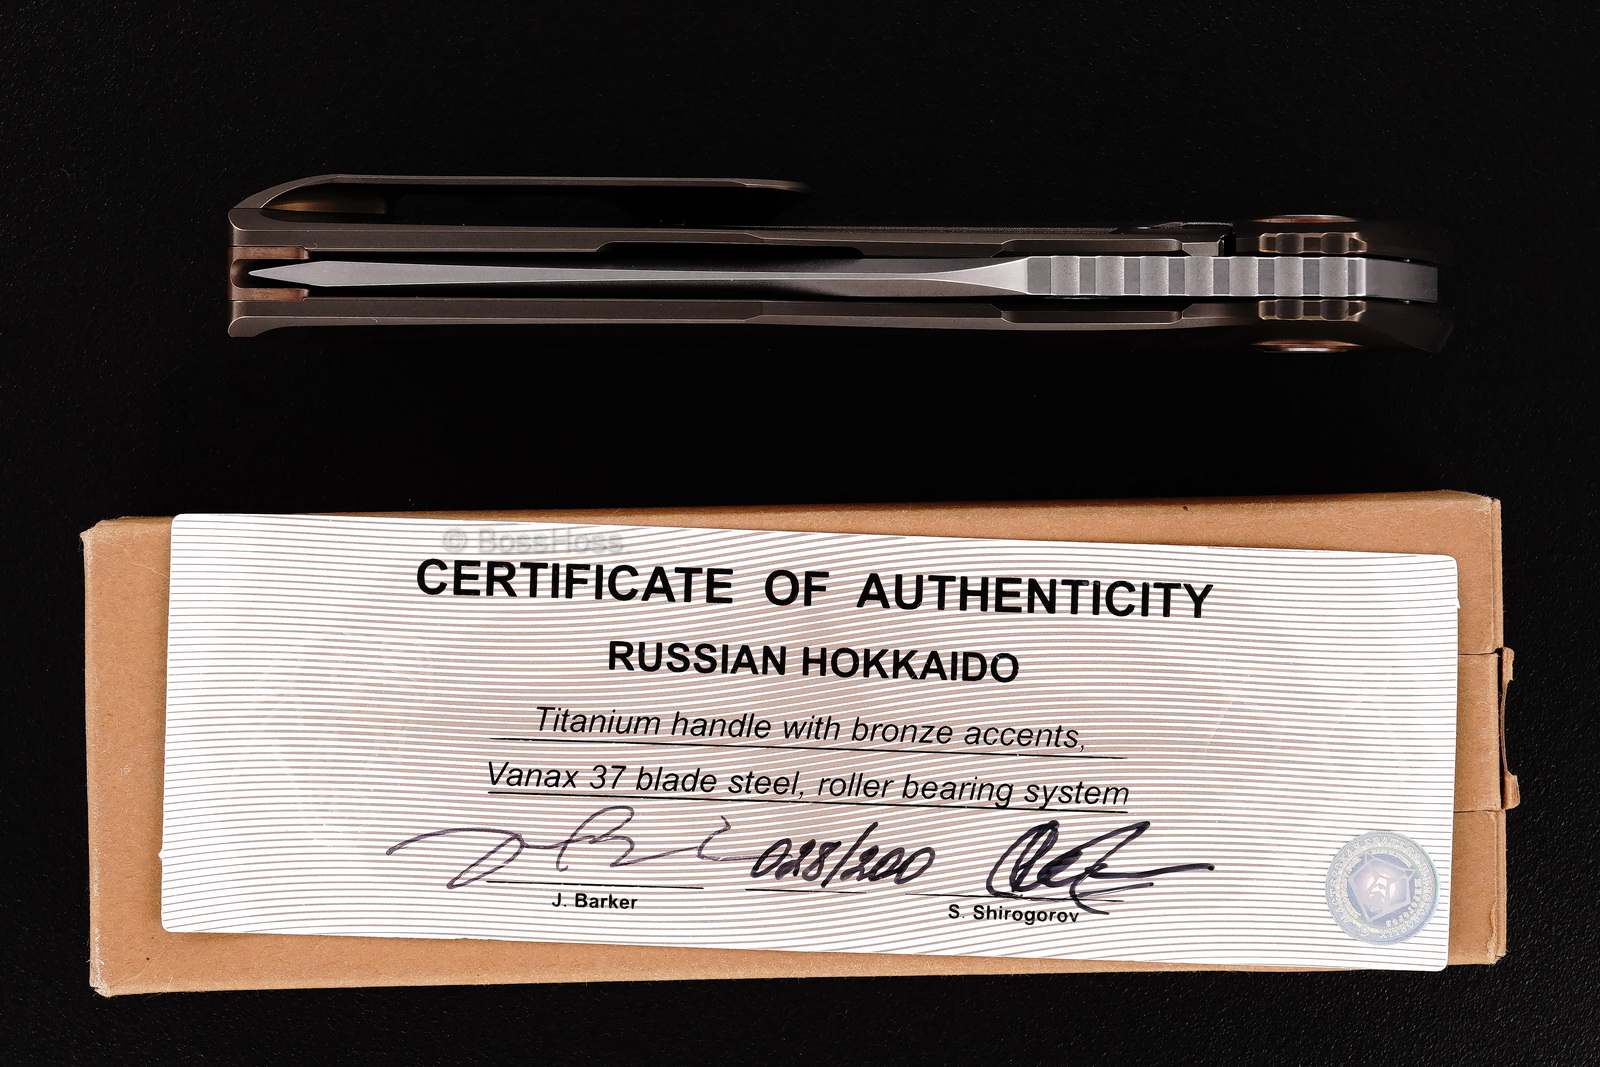 Sergey Shirogorov / John Barker Limited Edition Russian Hokkaido Flipper Collab